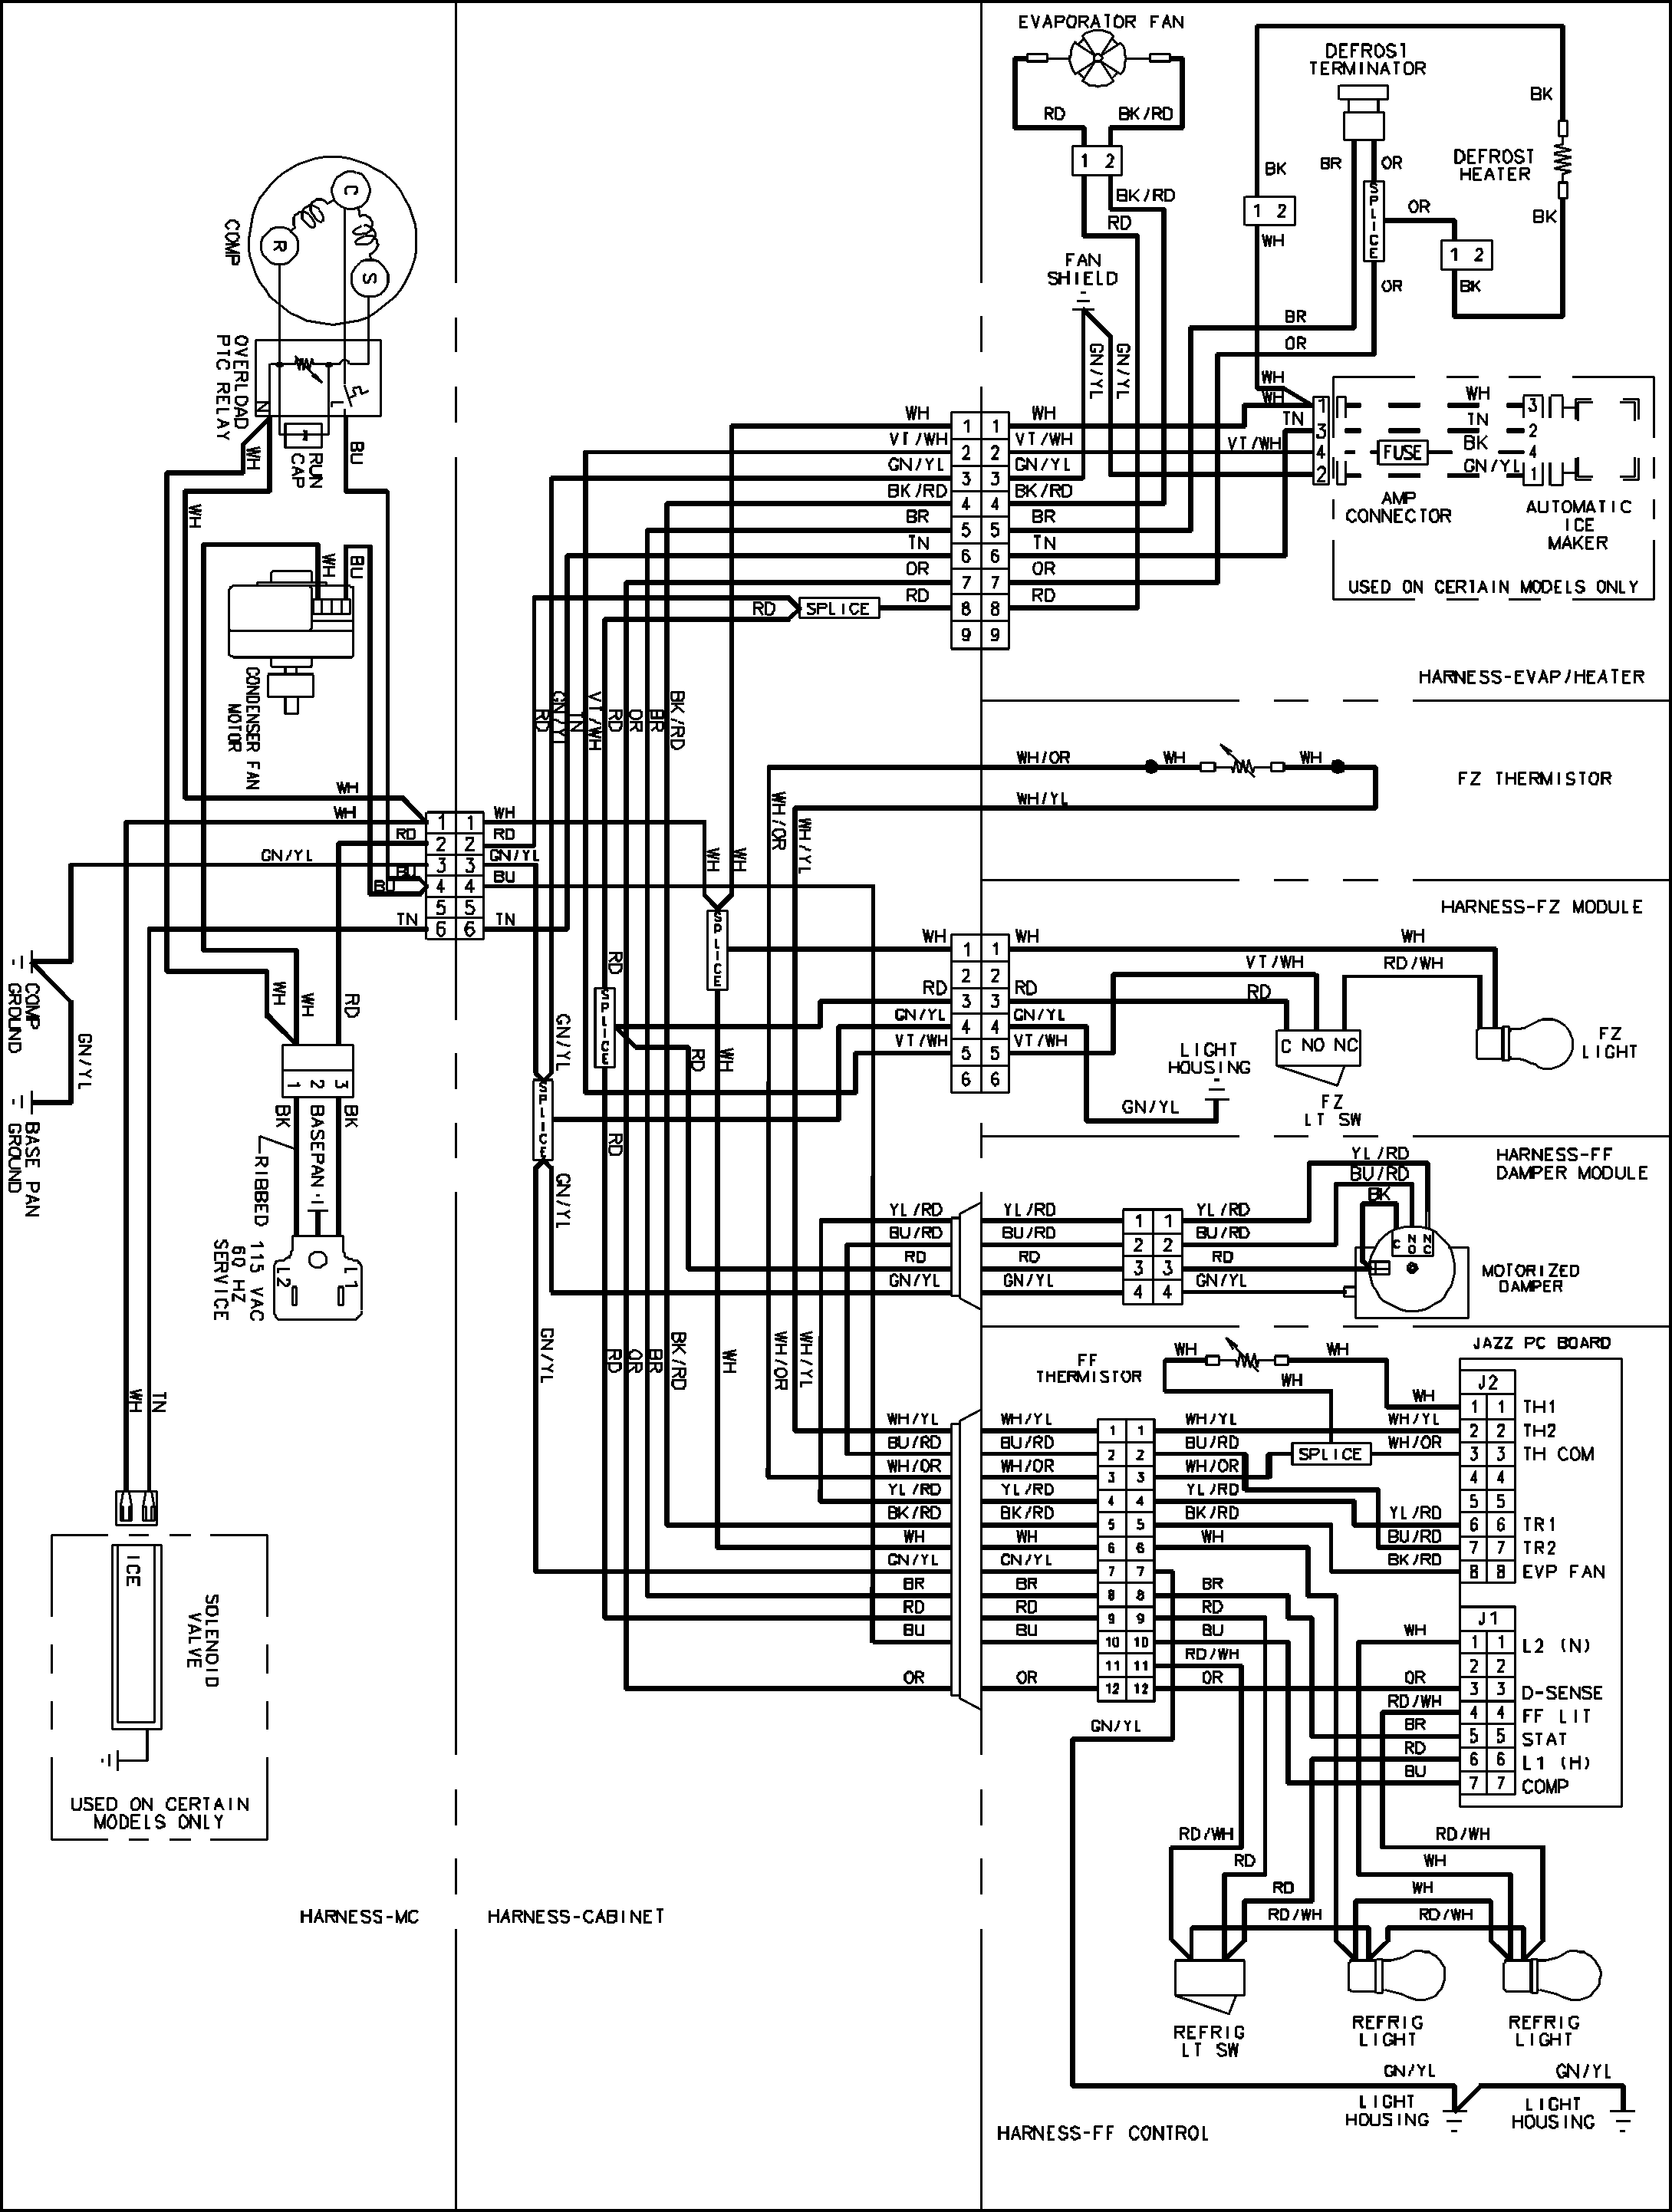 Ge Dryer Wiring Diagram General Motors Wiring Diagrams Wiring M0703075 00011 Z2UgZHJ5ZXIgd2lyaW5nIGRpYWdyYW0g